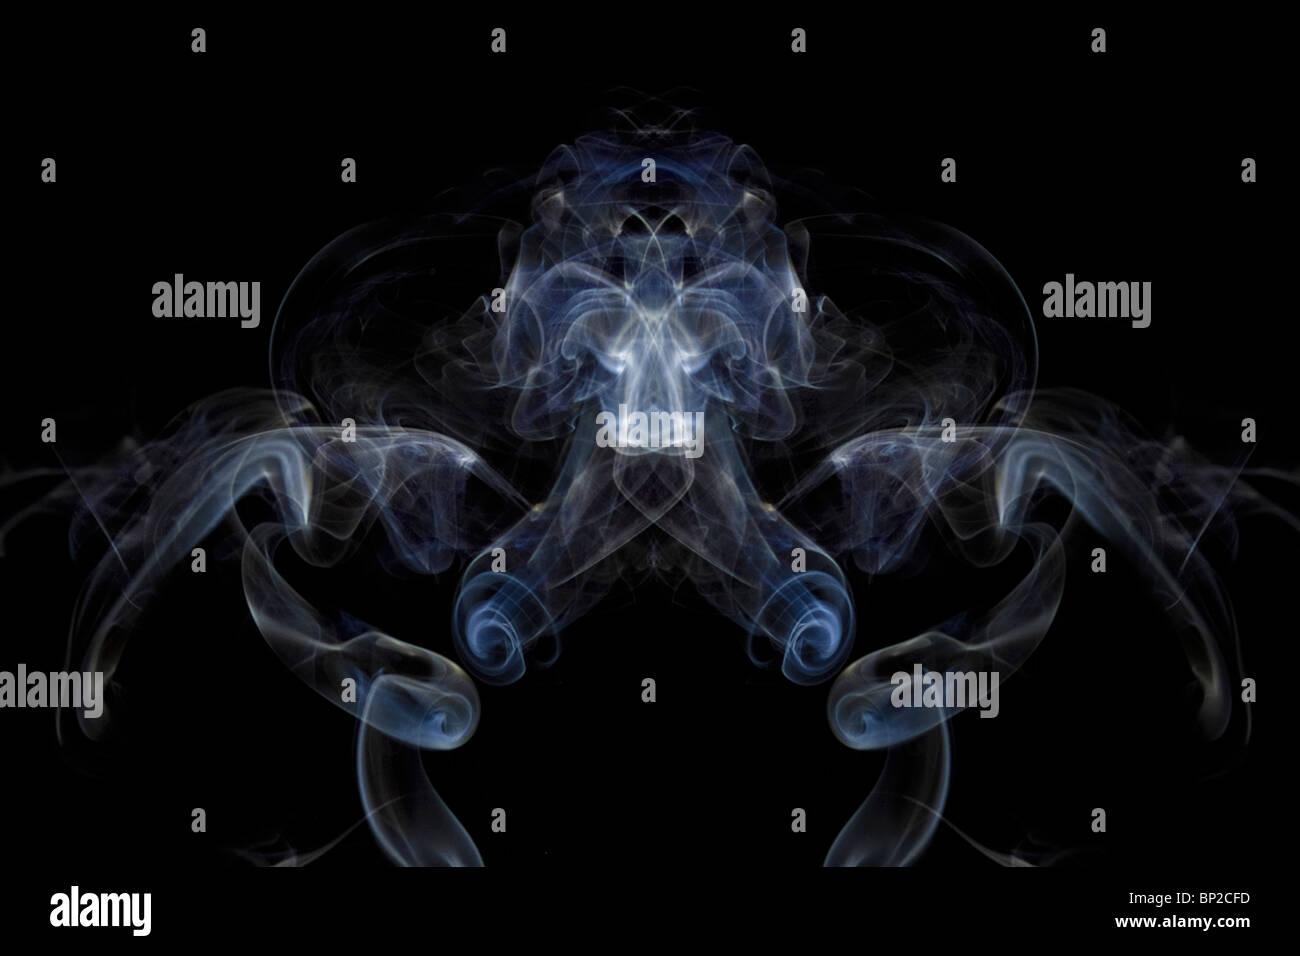 Smoke, Art, Photography, colourful, swirls, waves, colour, trippy, imaginative - Stock Image